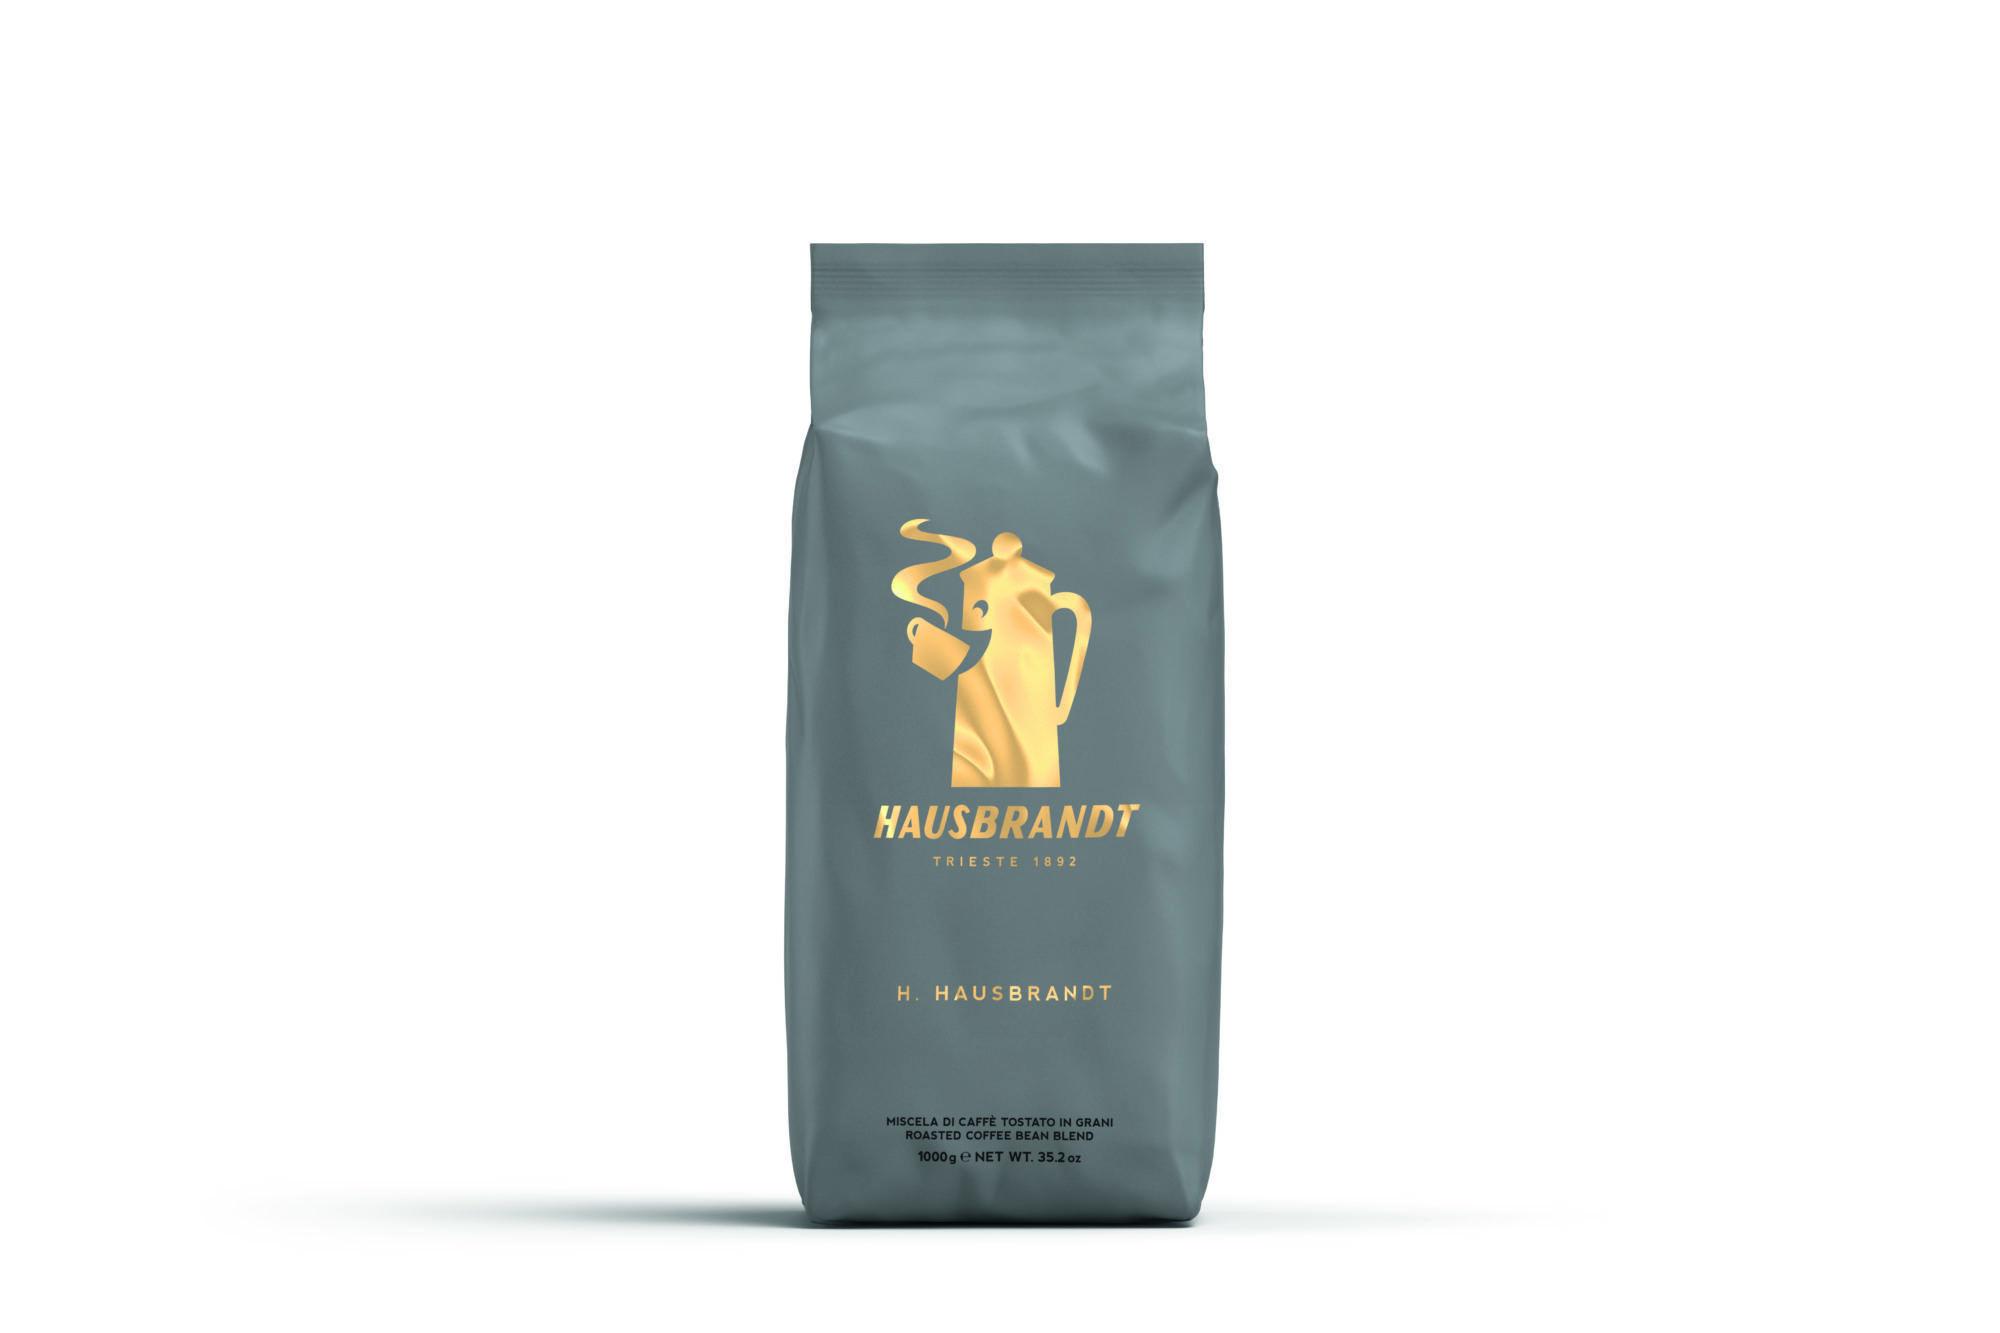 HAUSBRANDT Caffé H+H 6 X 1 KG Bohnen im Beutel